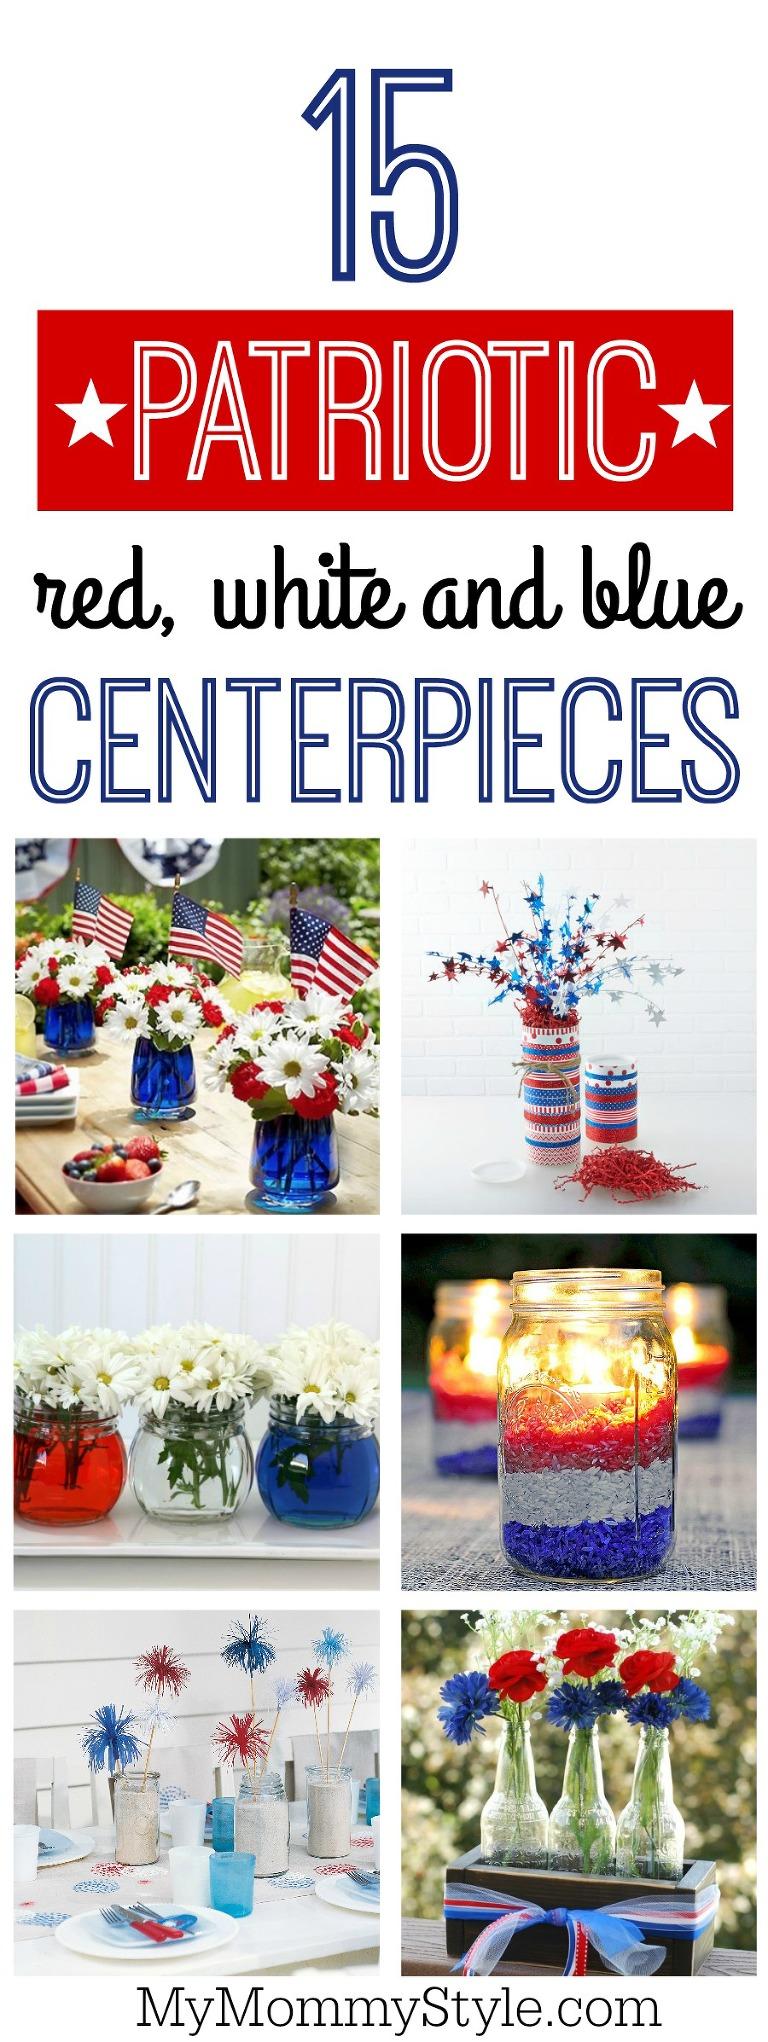 15 patriotic centerpieces